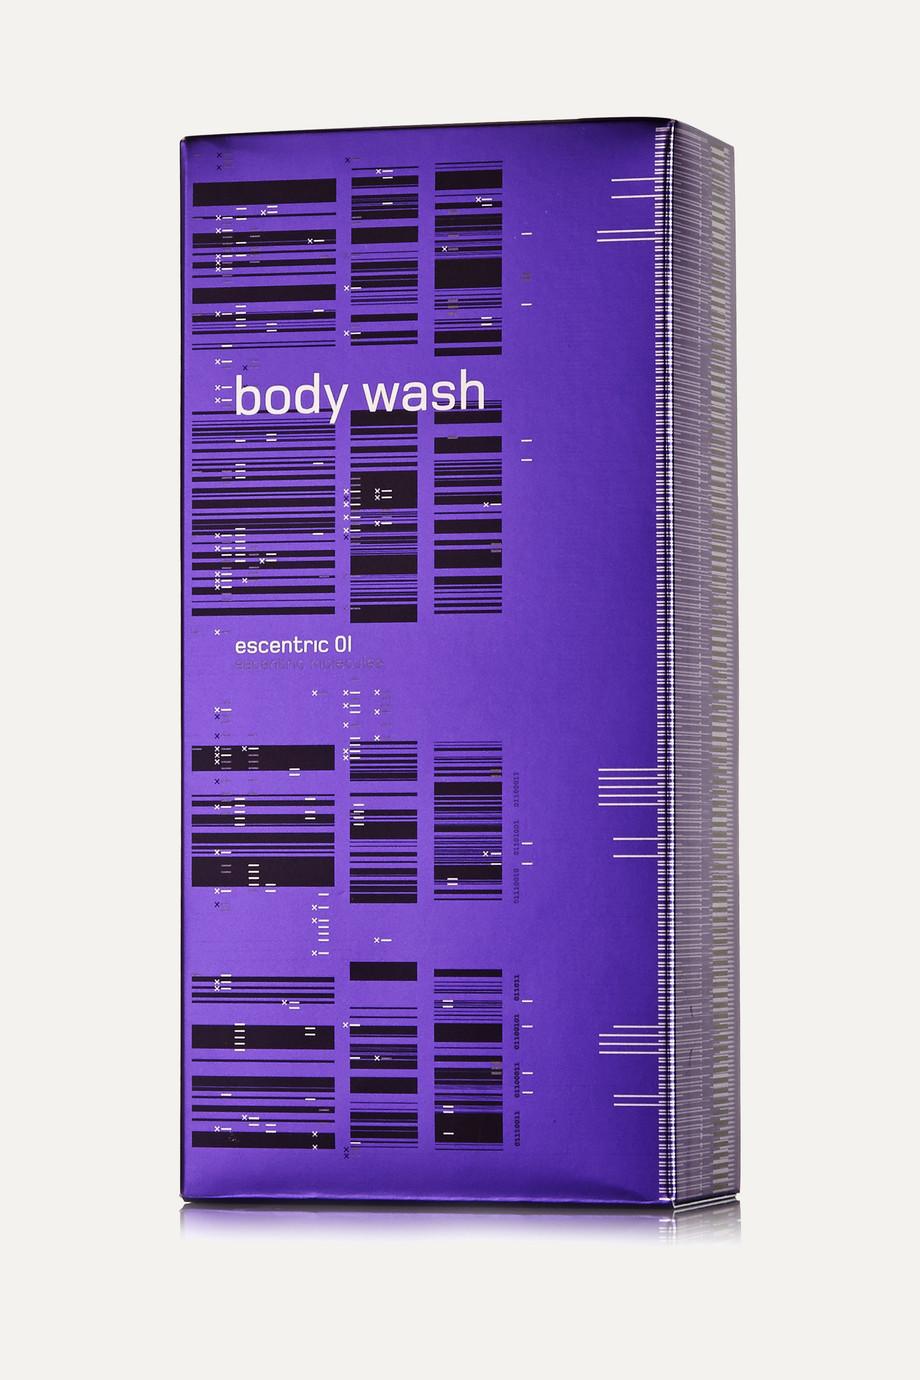 Escentric Molecules Escentric 01 Body Wash, 200 ml – Waschgel